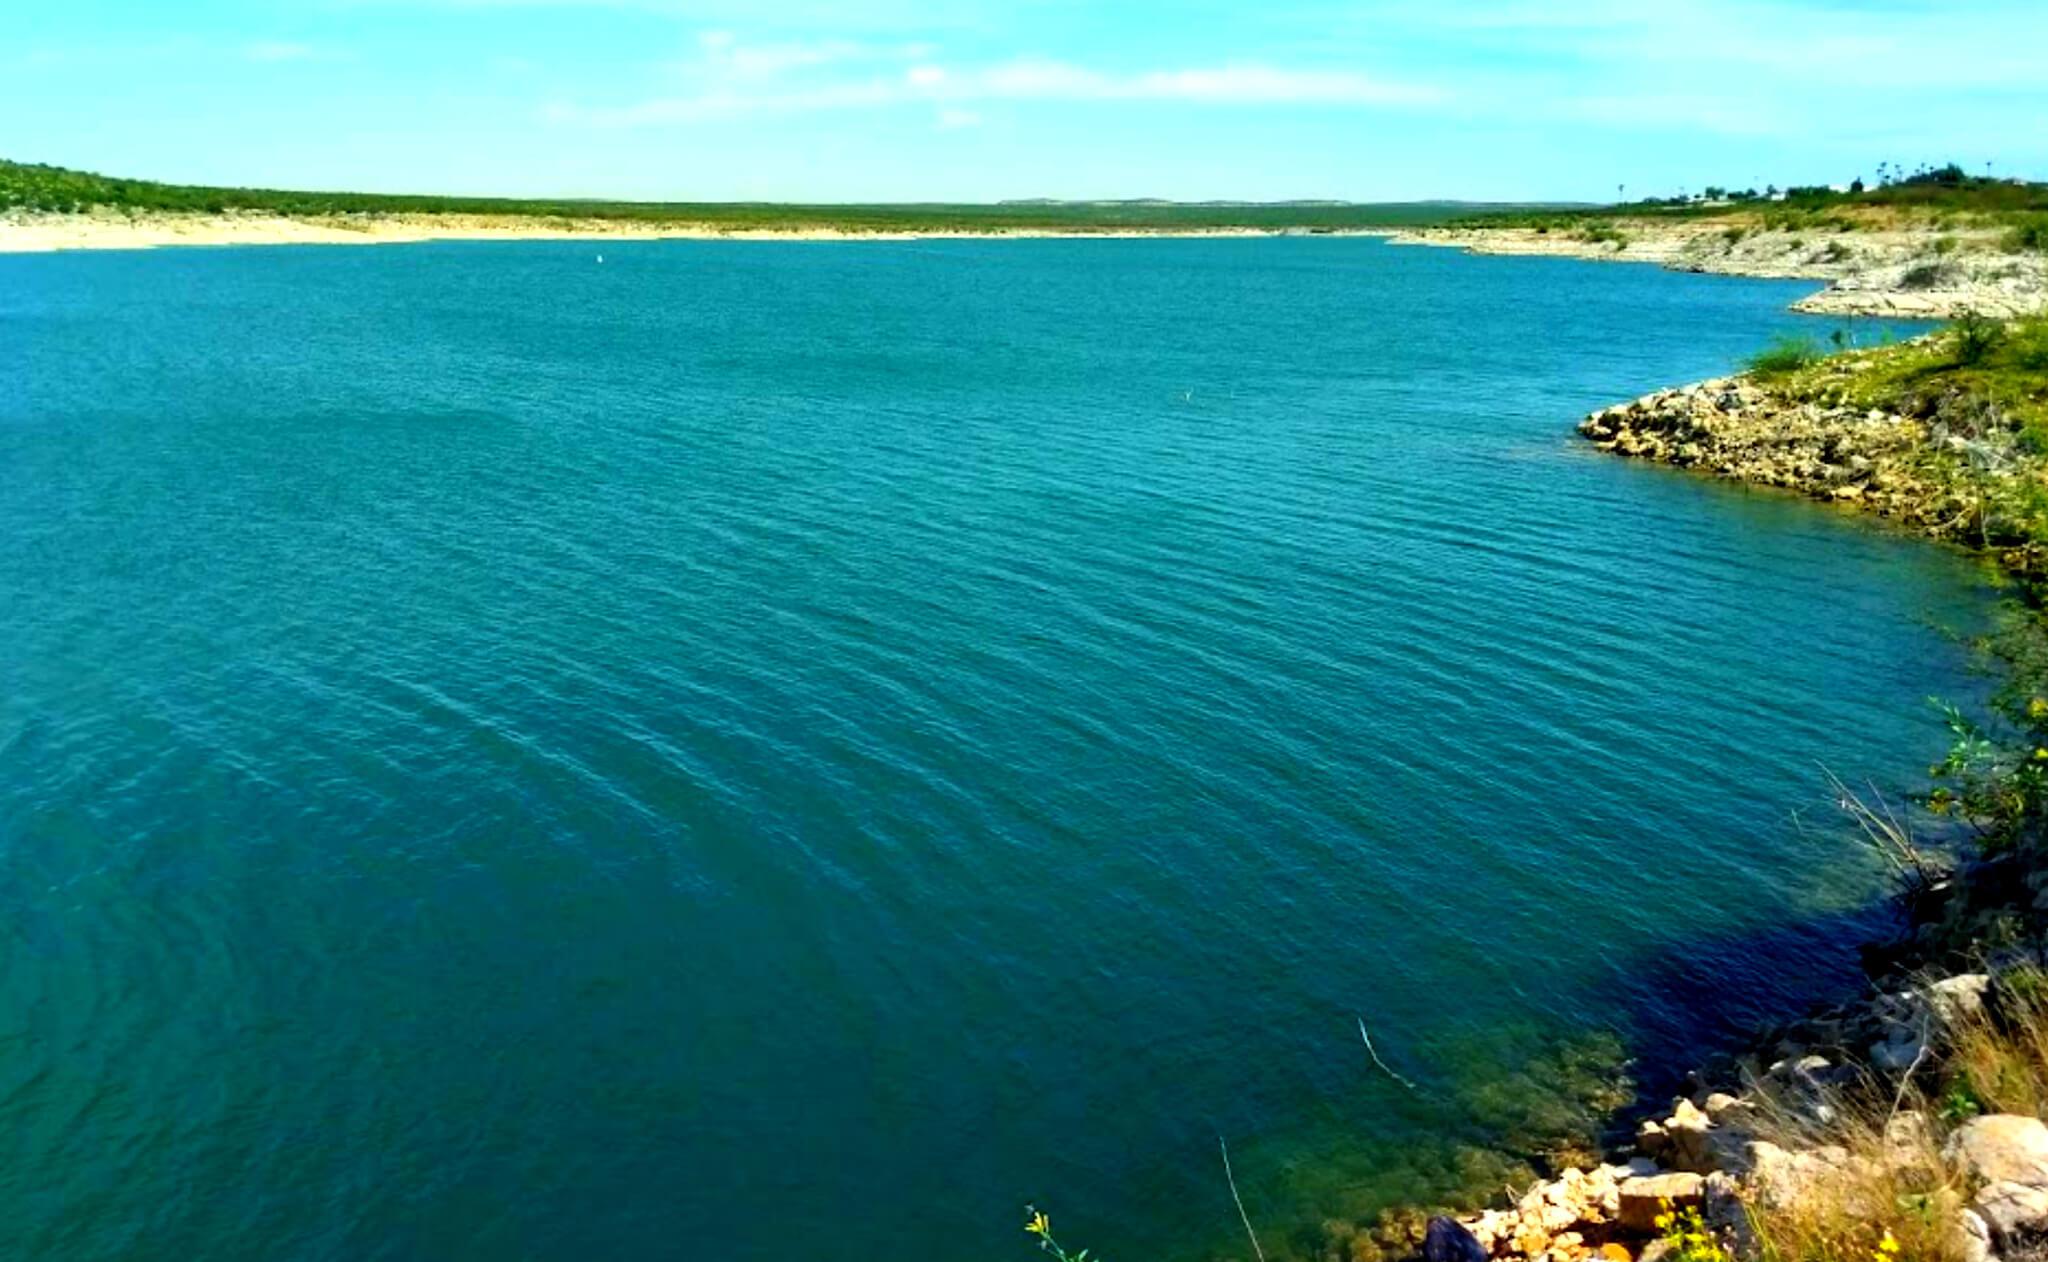 Amistad-Lake-Fishing-Report-Guide-Texas-TX-03